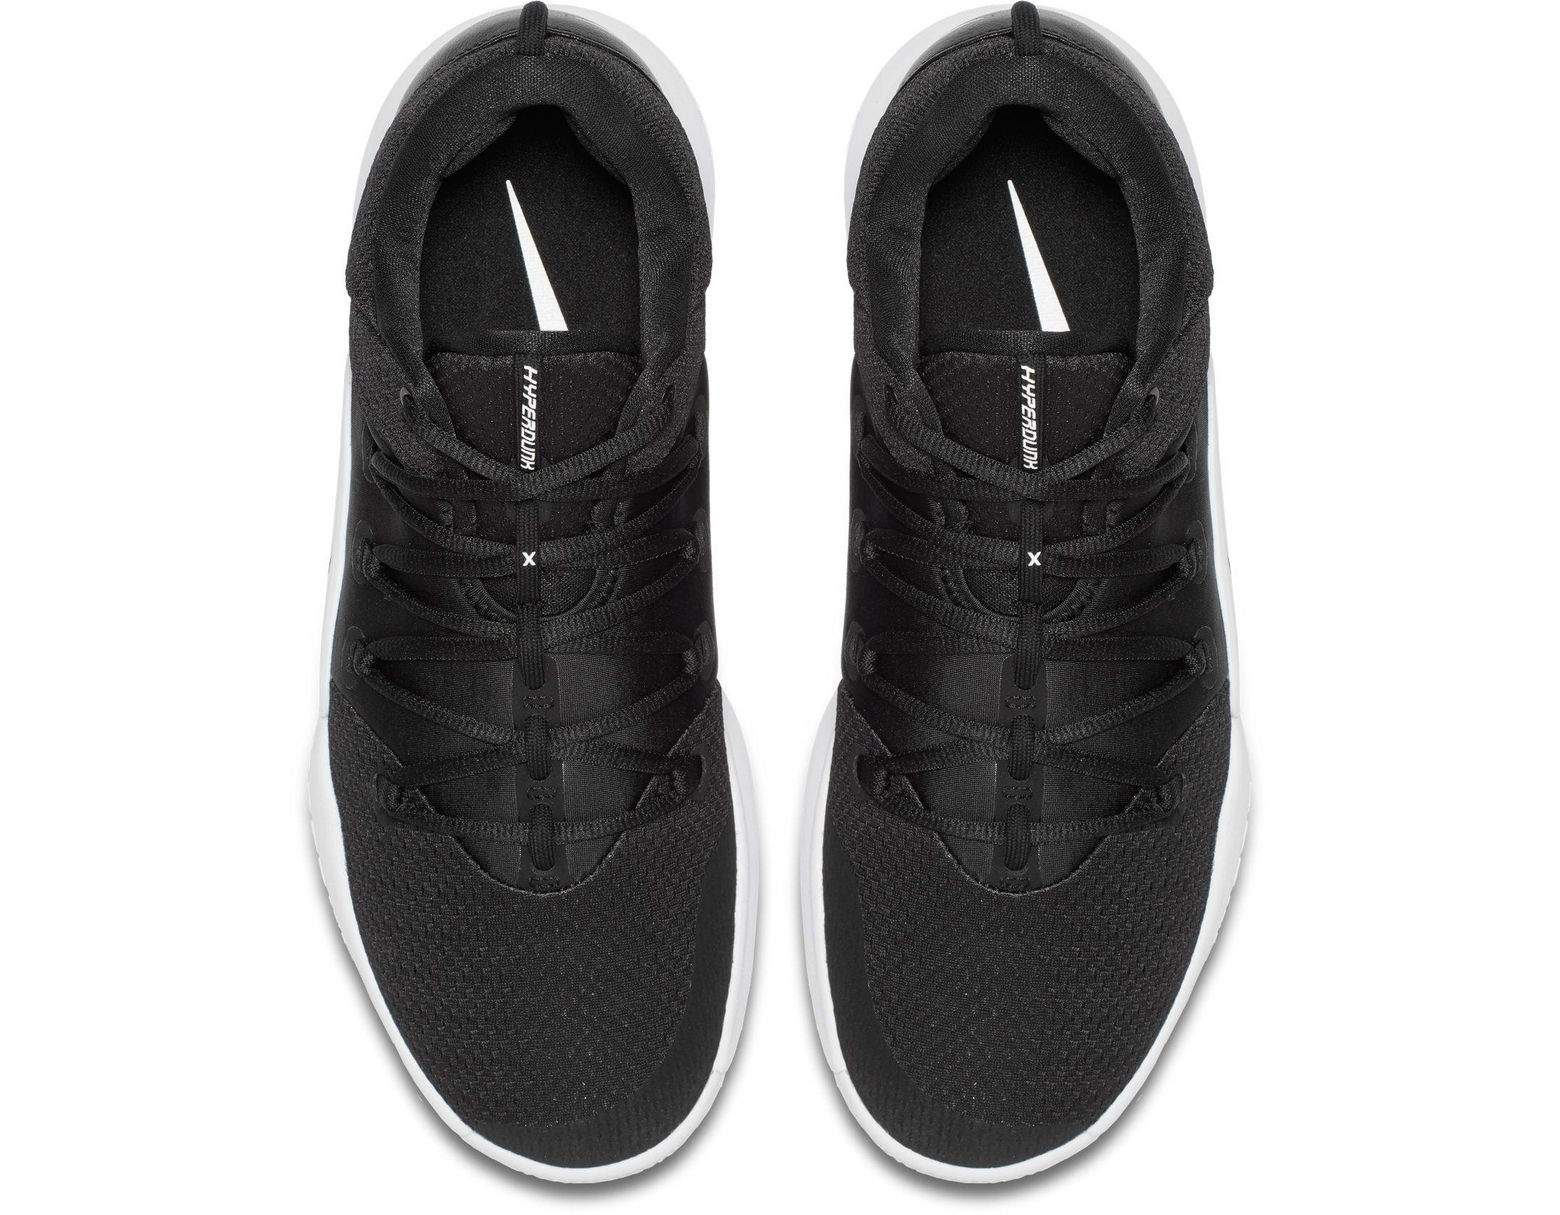 buy popular 187c2 94214 Lyst - Nike Hyperdunk X Low Tb Basketball Shoes in Black for Men